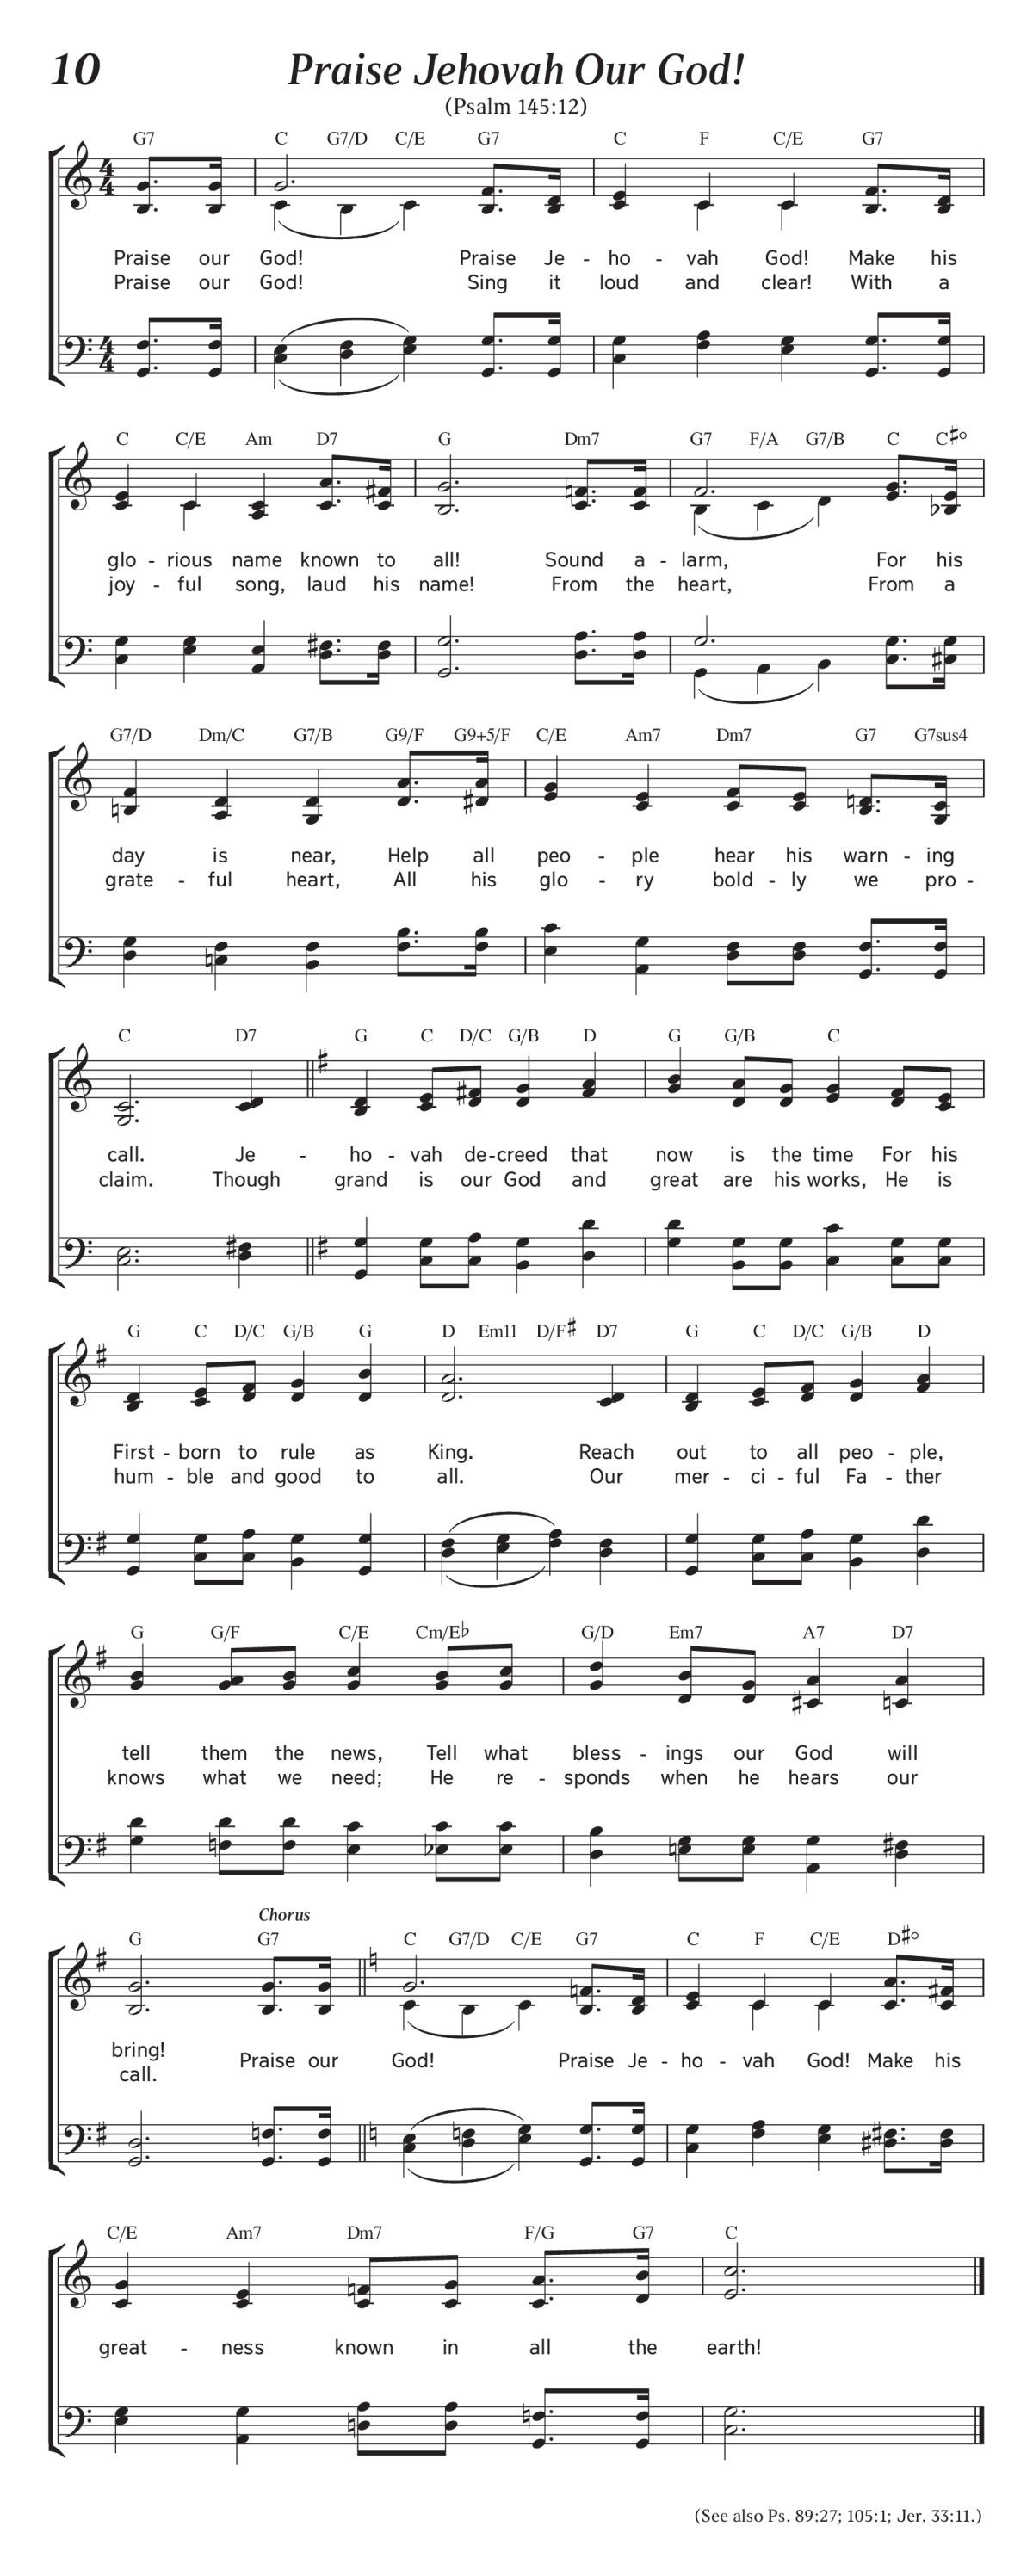 Urhobo Praise Songs Lyrics